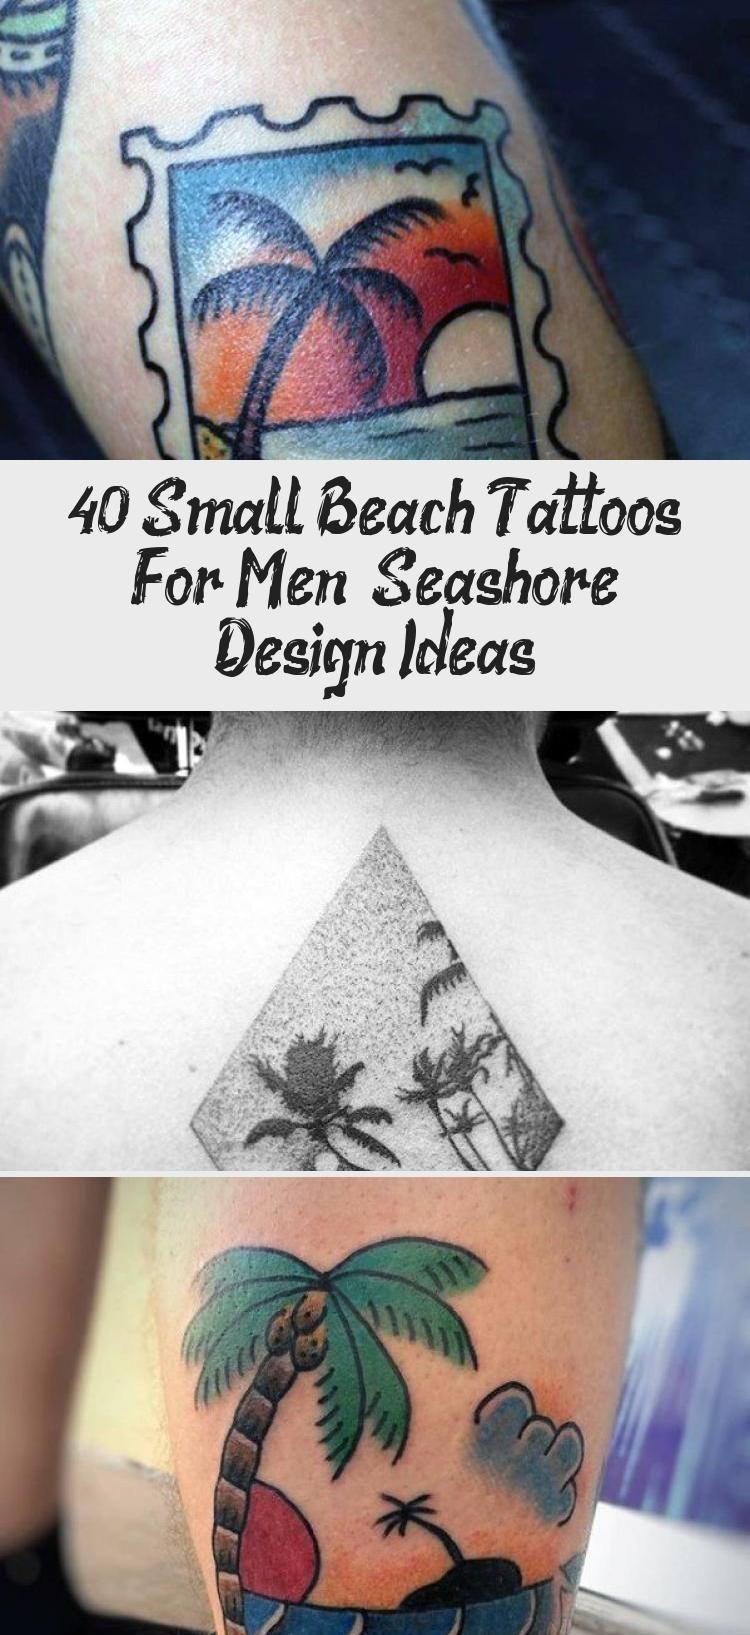 Photo of 40 Small Beach Tattoos For Men – Seashore Design Ideas – Tattoos